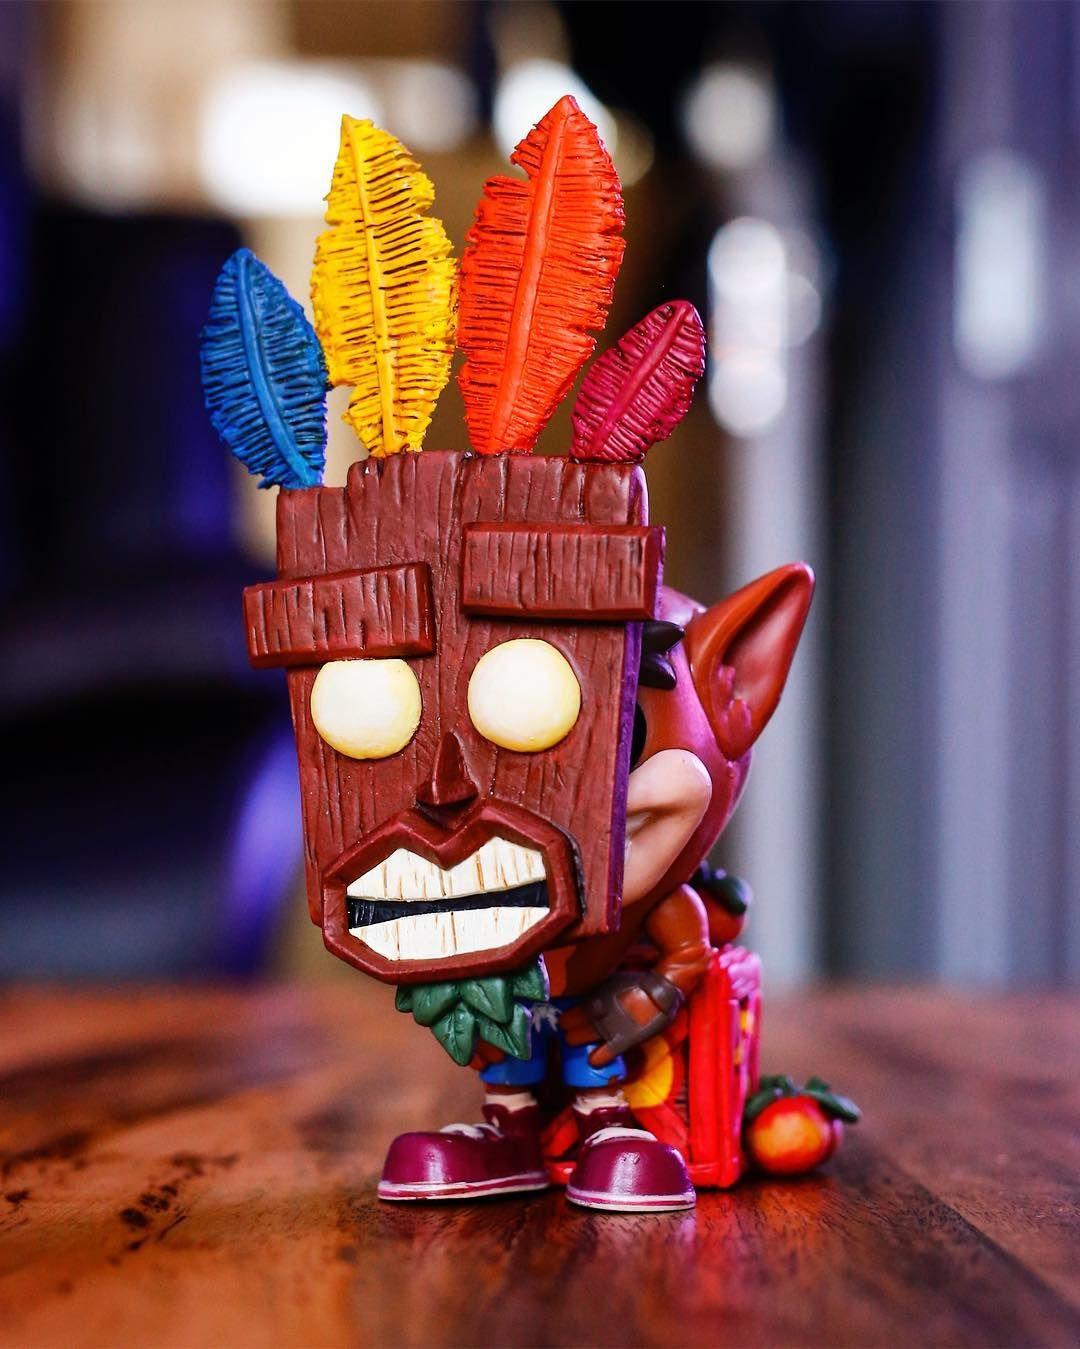 Crash Custom Funko Pop By Abbernaffy Customs Abbernaffy Customs On Instagram Here It Is Aku Aku Crash This Th Custom Funko Pop Pop Custom Funko Pop Toys